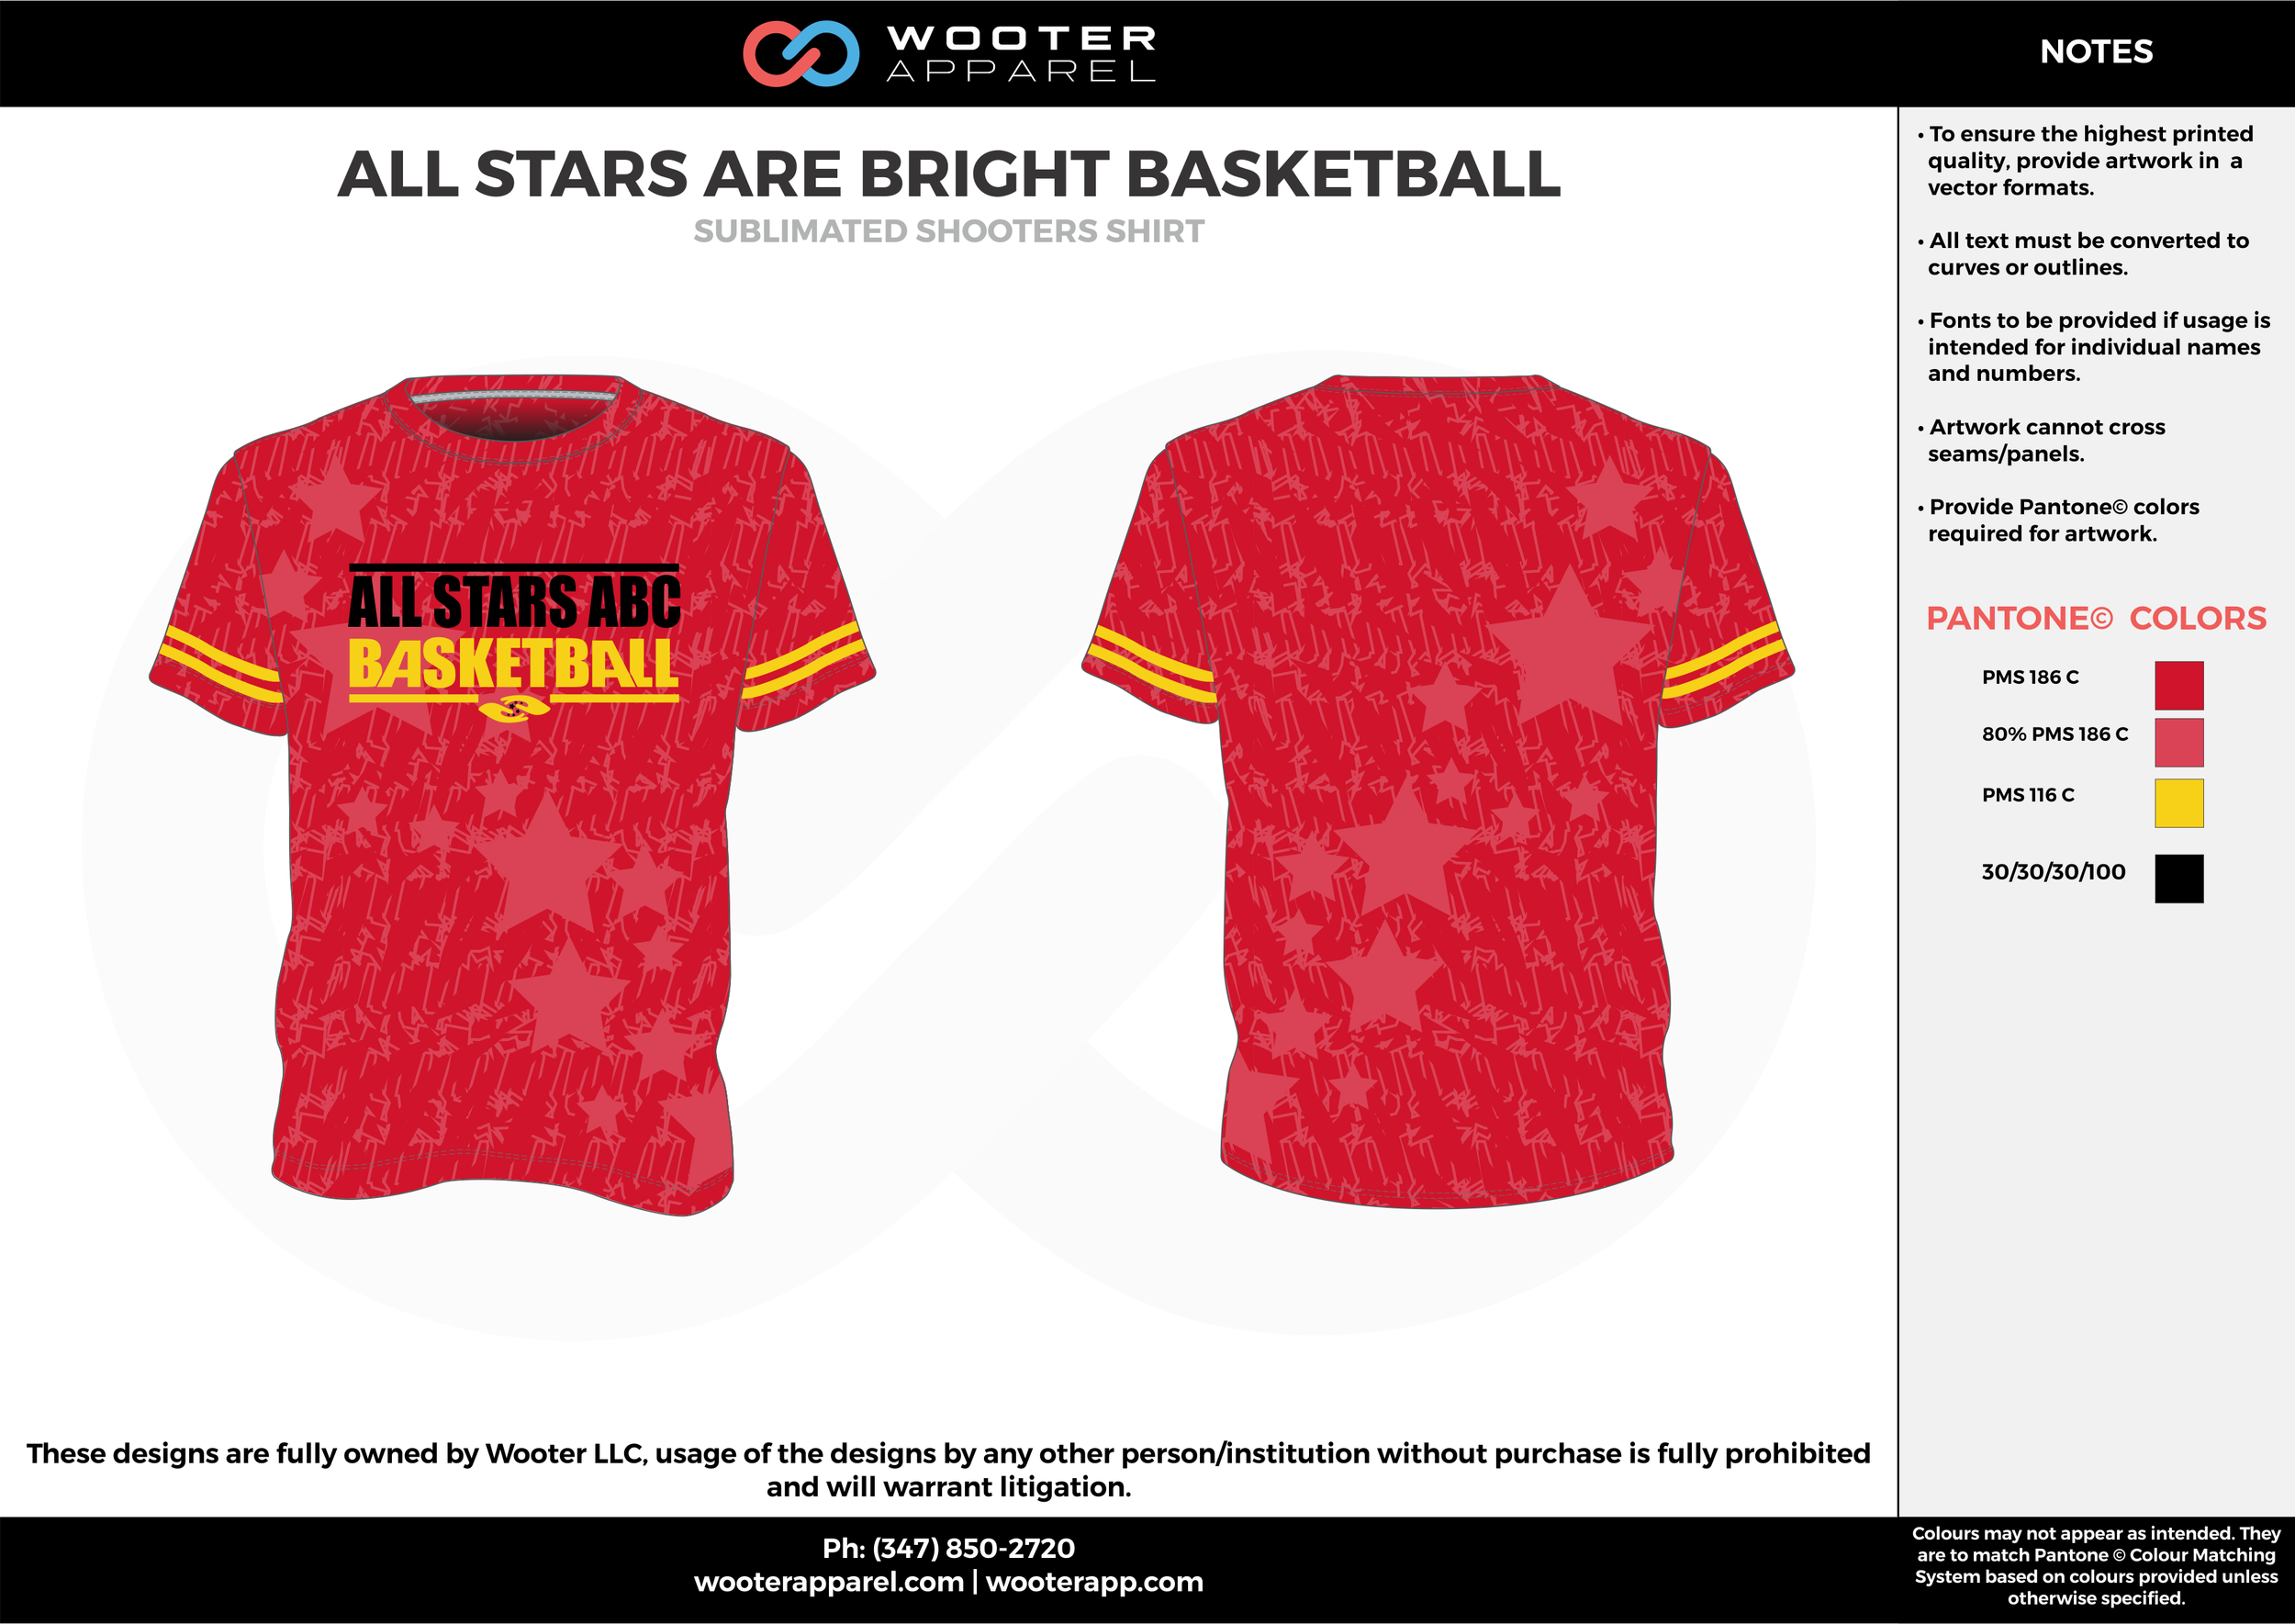 ALL STARS ARE BRIGHT BASKETBALL red yellow black Basketball Long Sleeve Shooting Shirt